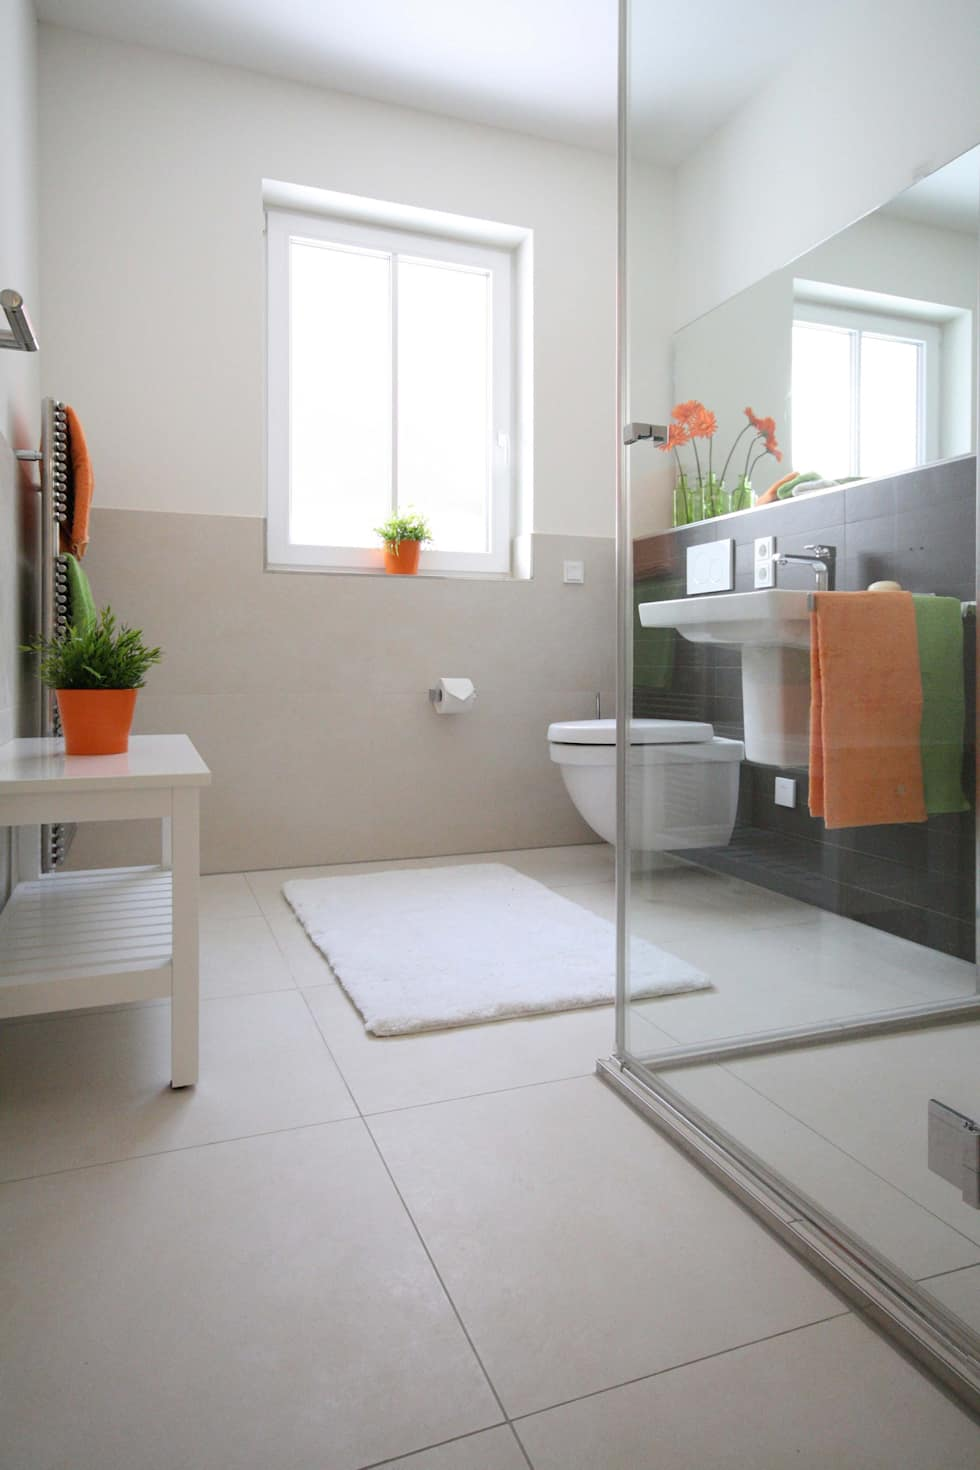 Home Staging Cornelia Reichel의 욕실